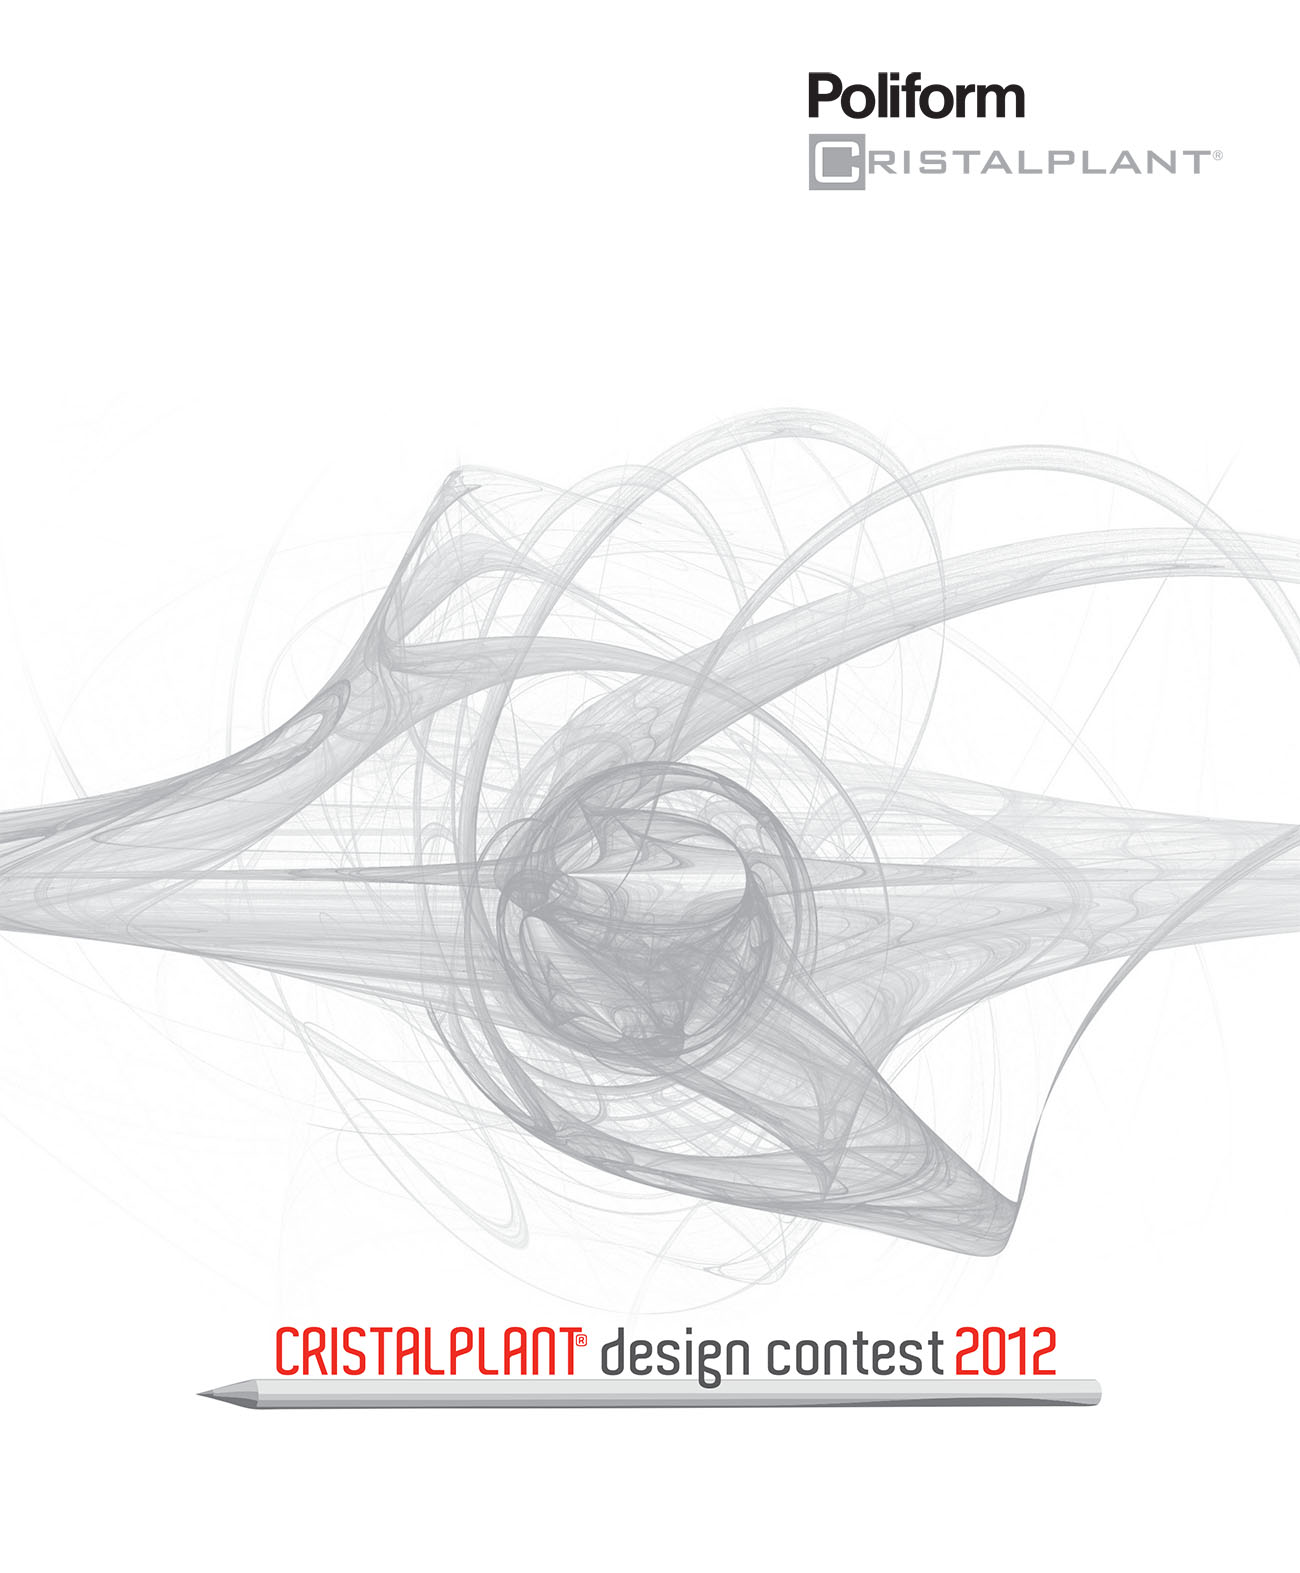 Cristalplant_BusettiGarutiRedaelli_Poliform-01